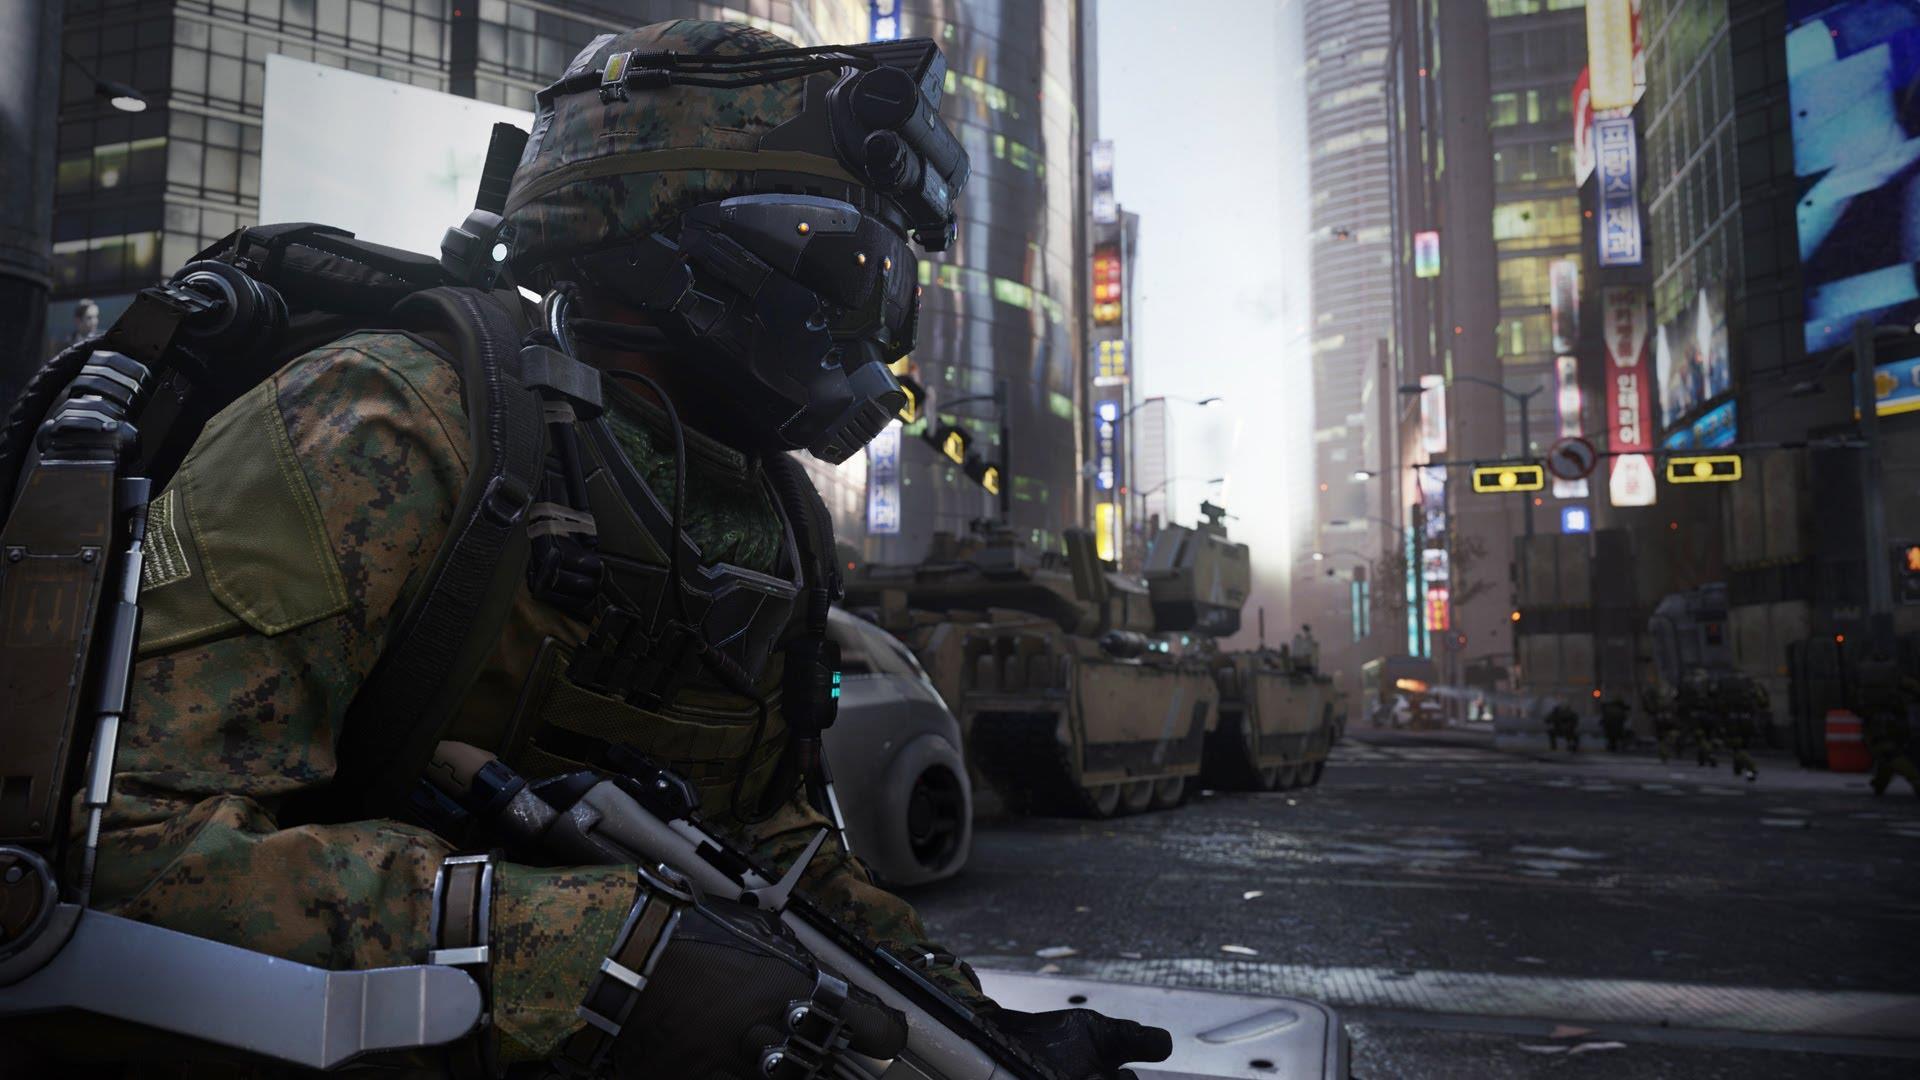 call_of_duty_advanced_warfare_soldier_uniform